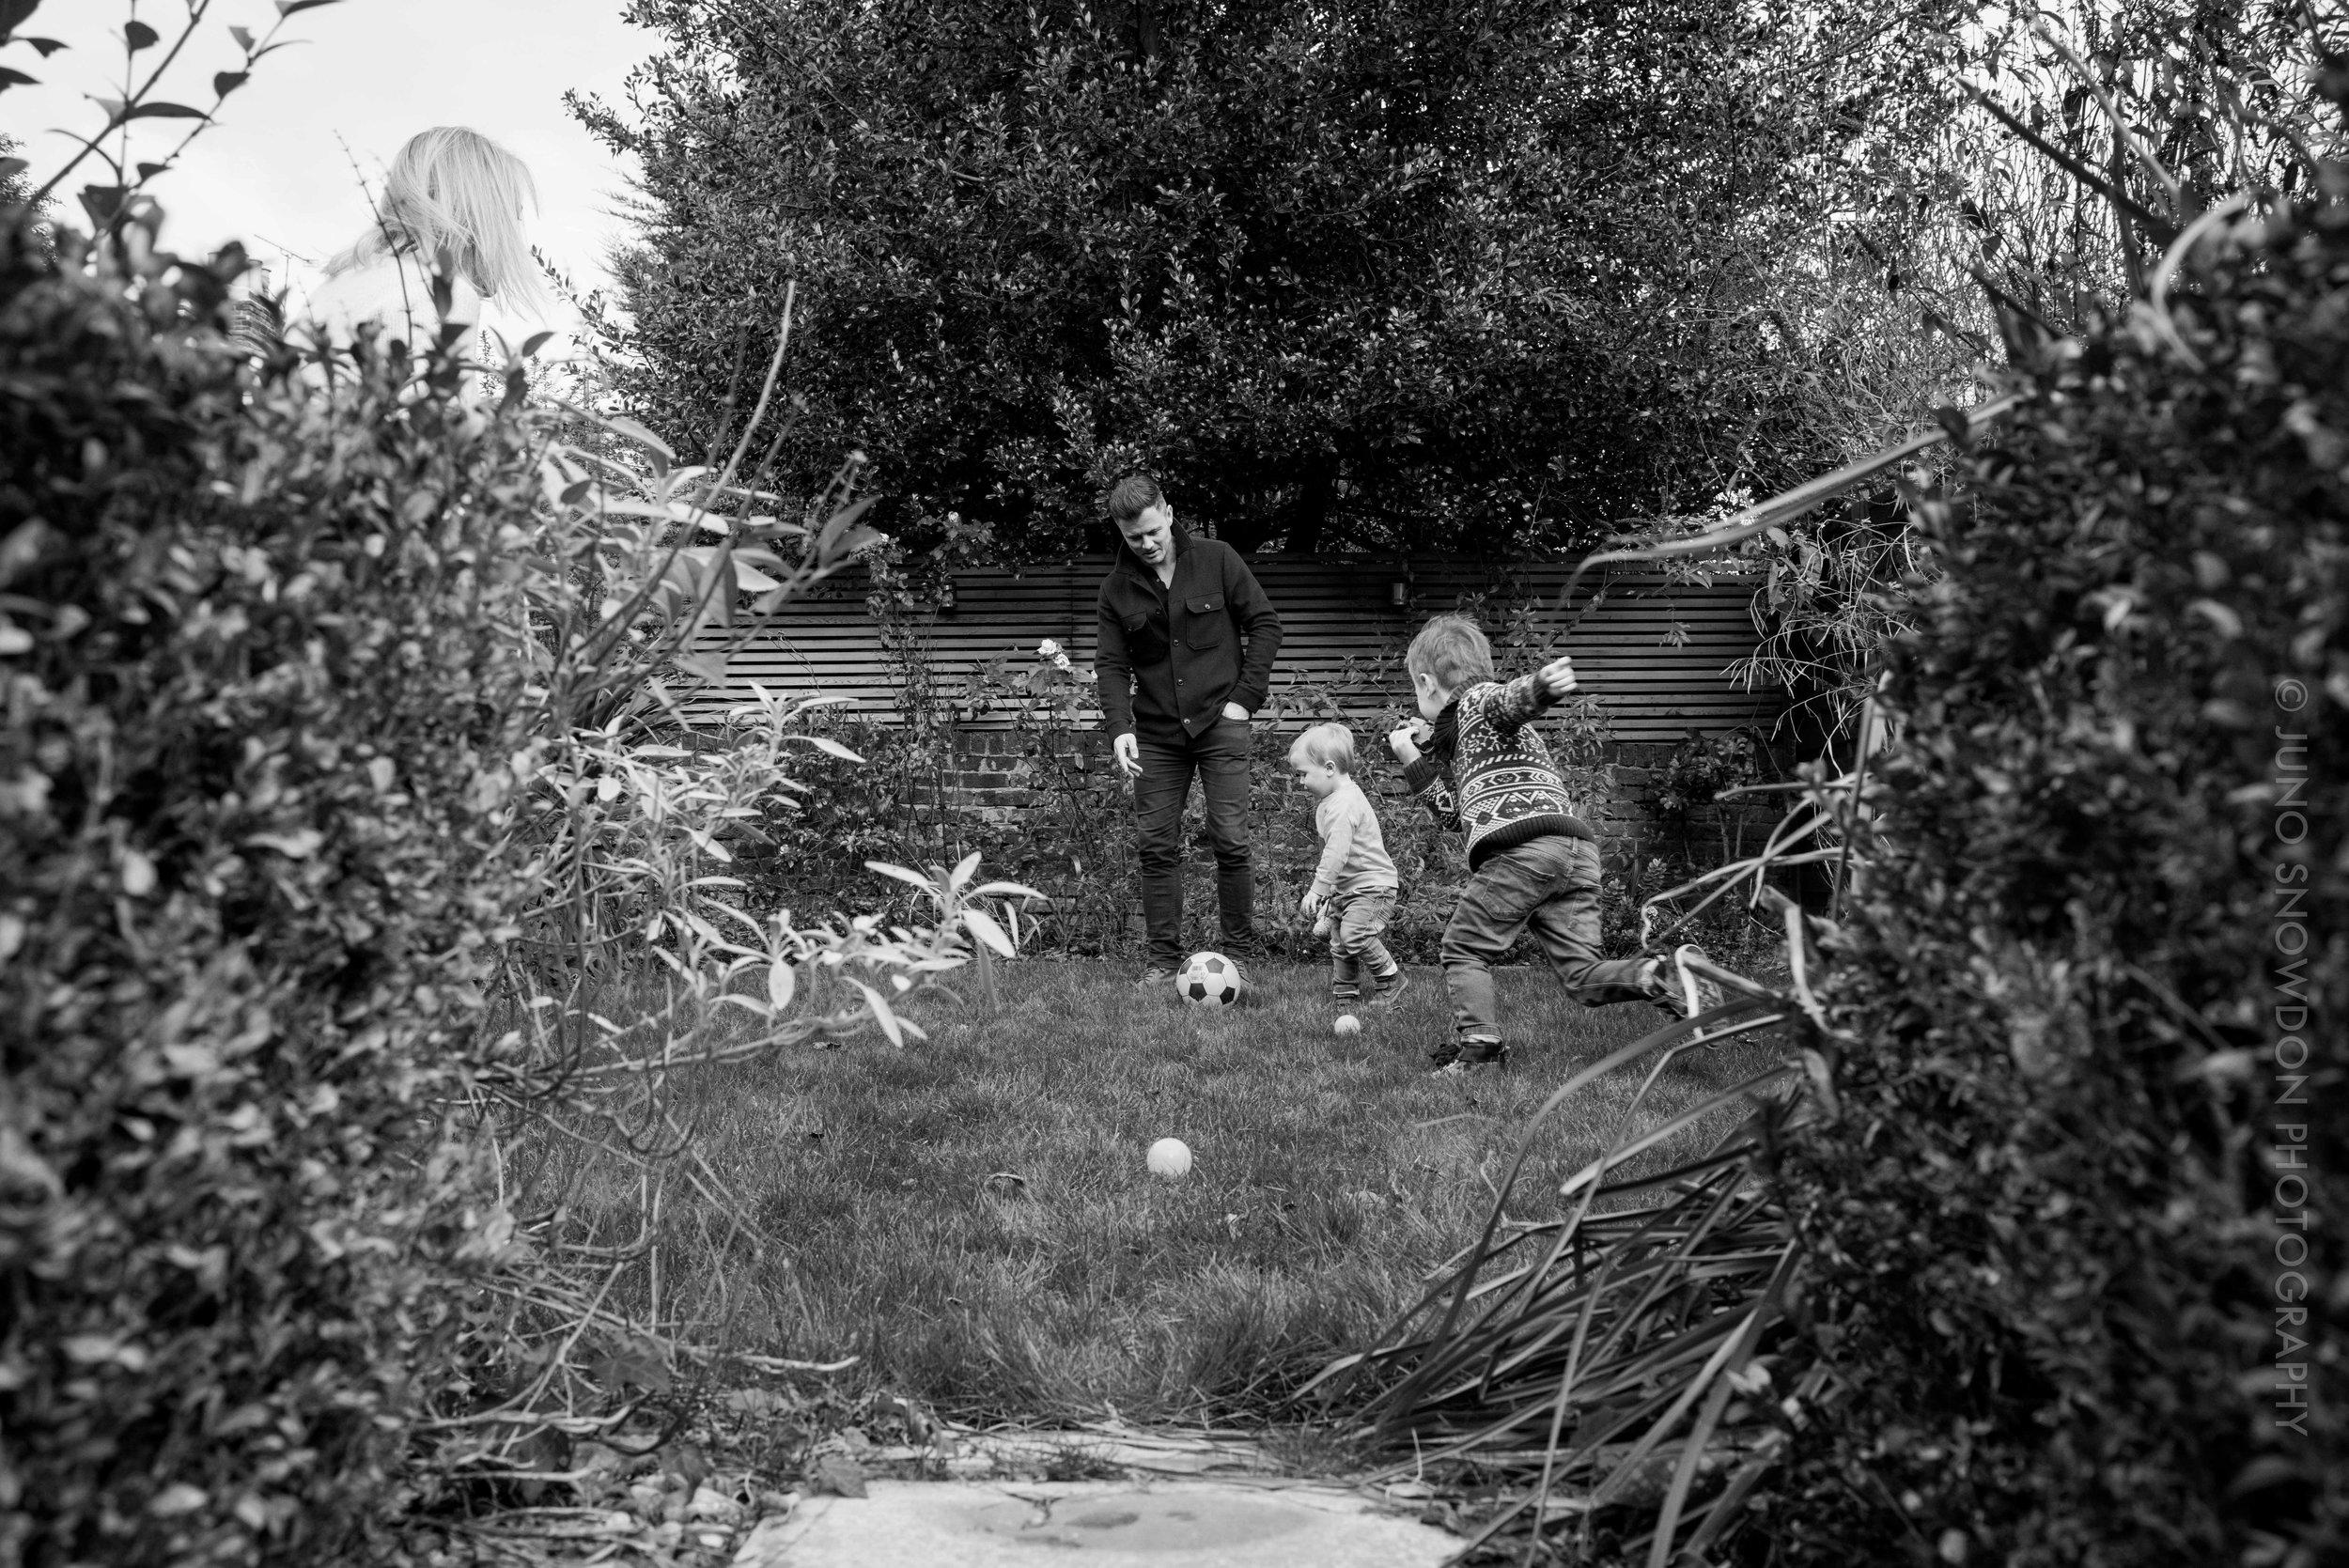 juno-snowdon-photography-family-portrait-9502.jpg